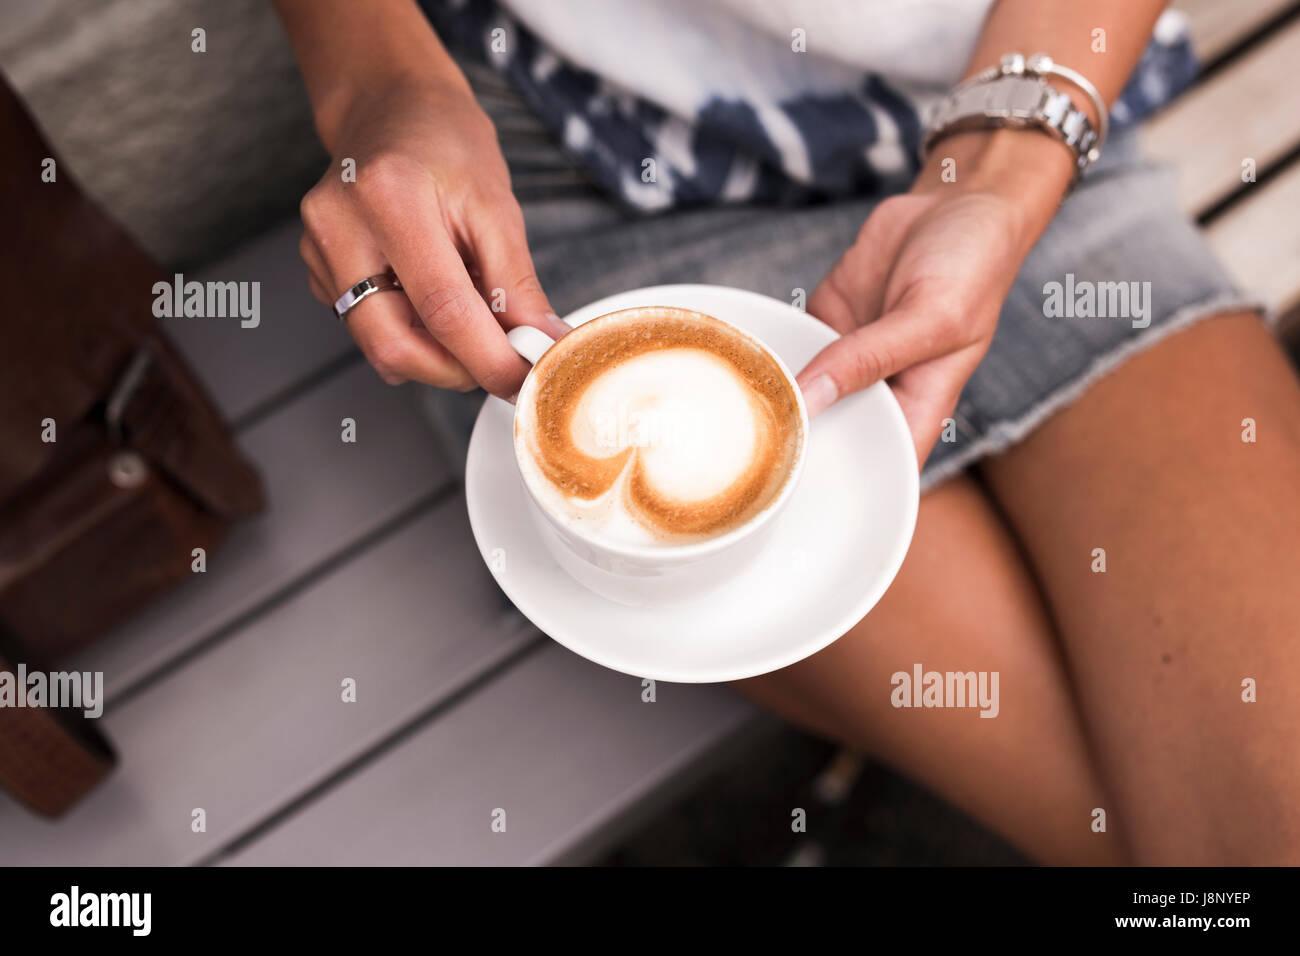 Woman holding Coffee cup avec du cappuccino Banque D'Images